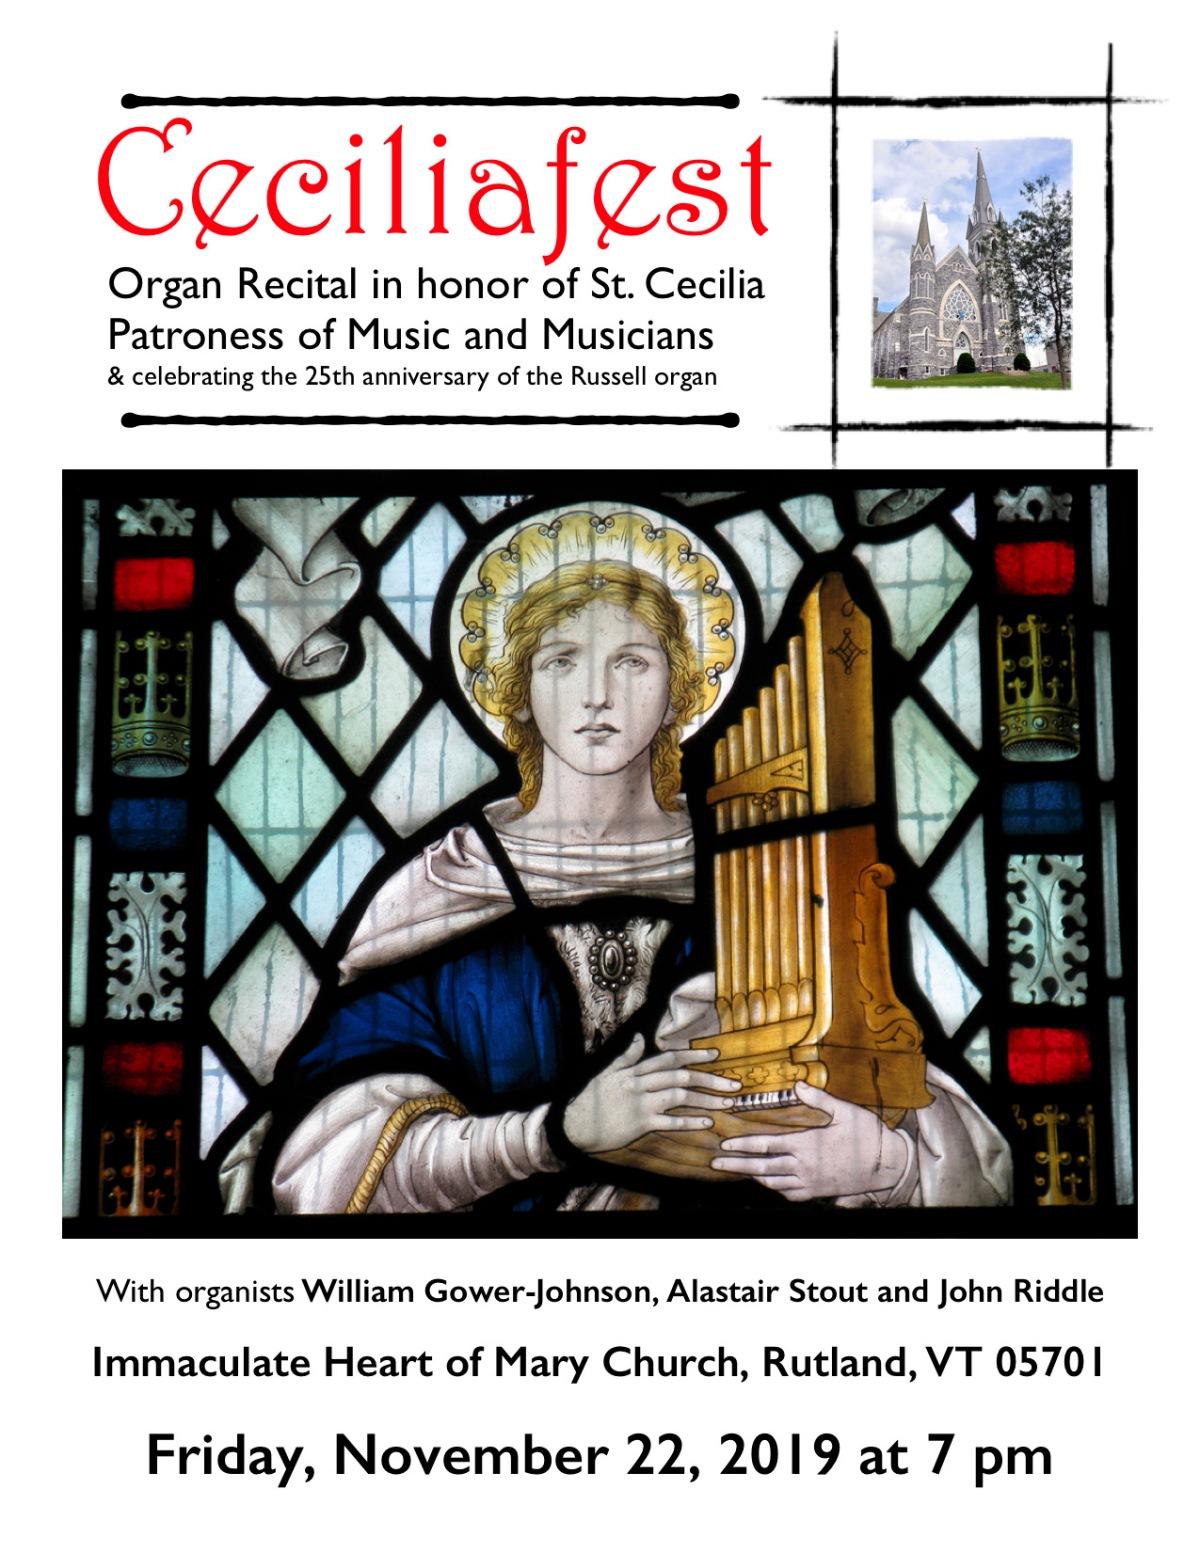 Nov. 22 ~ Ceciliafest OrganRecital